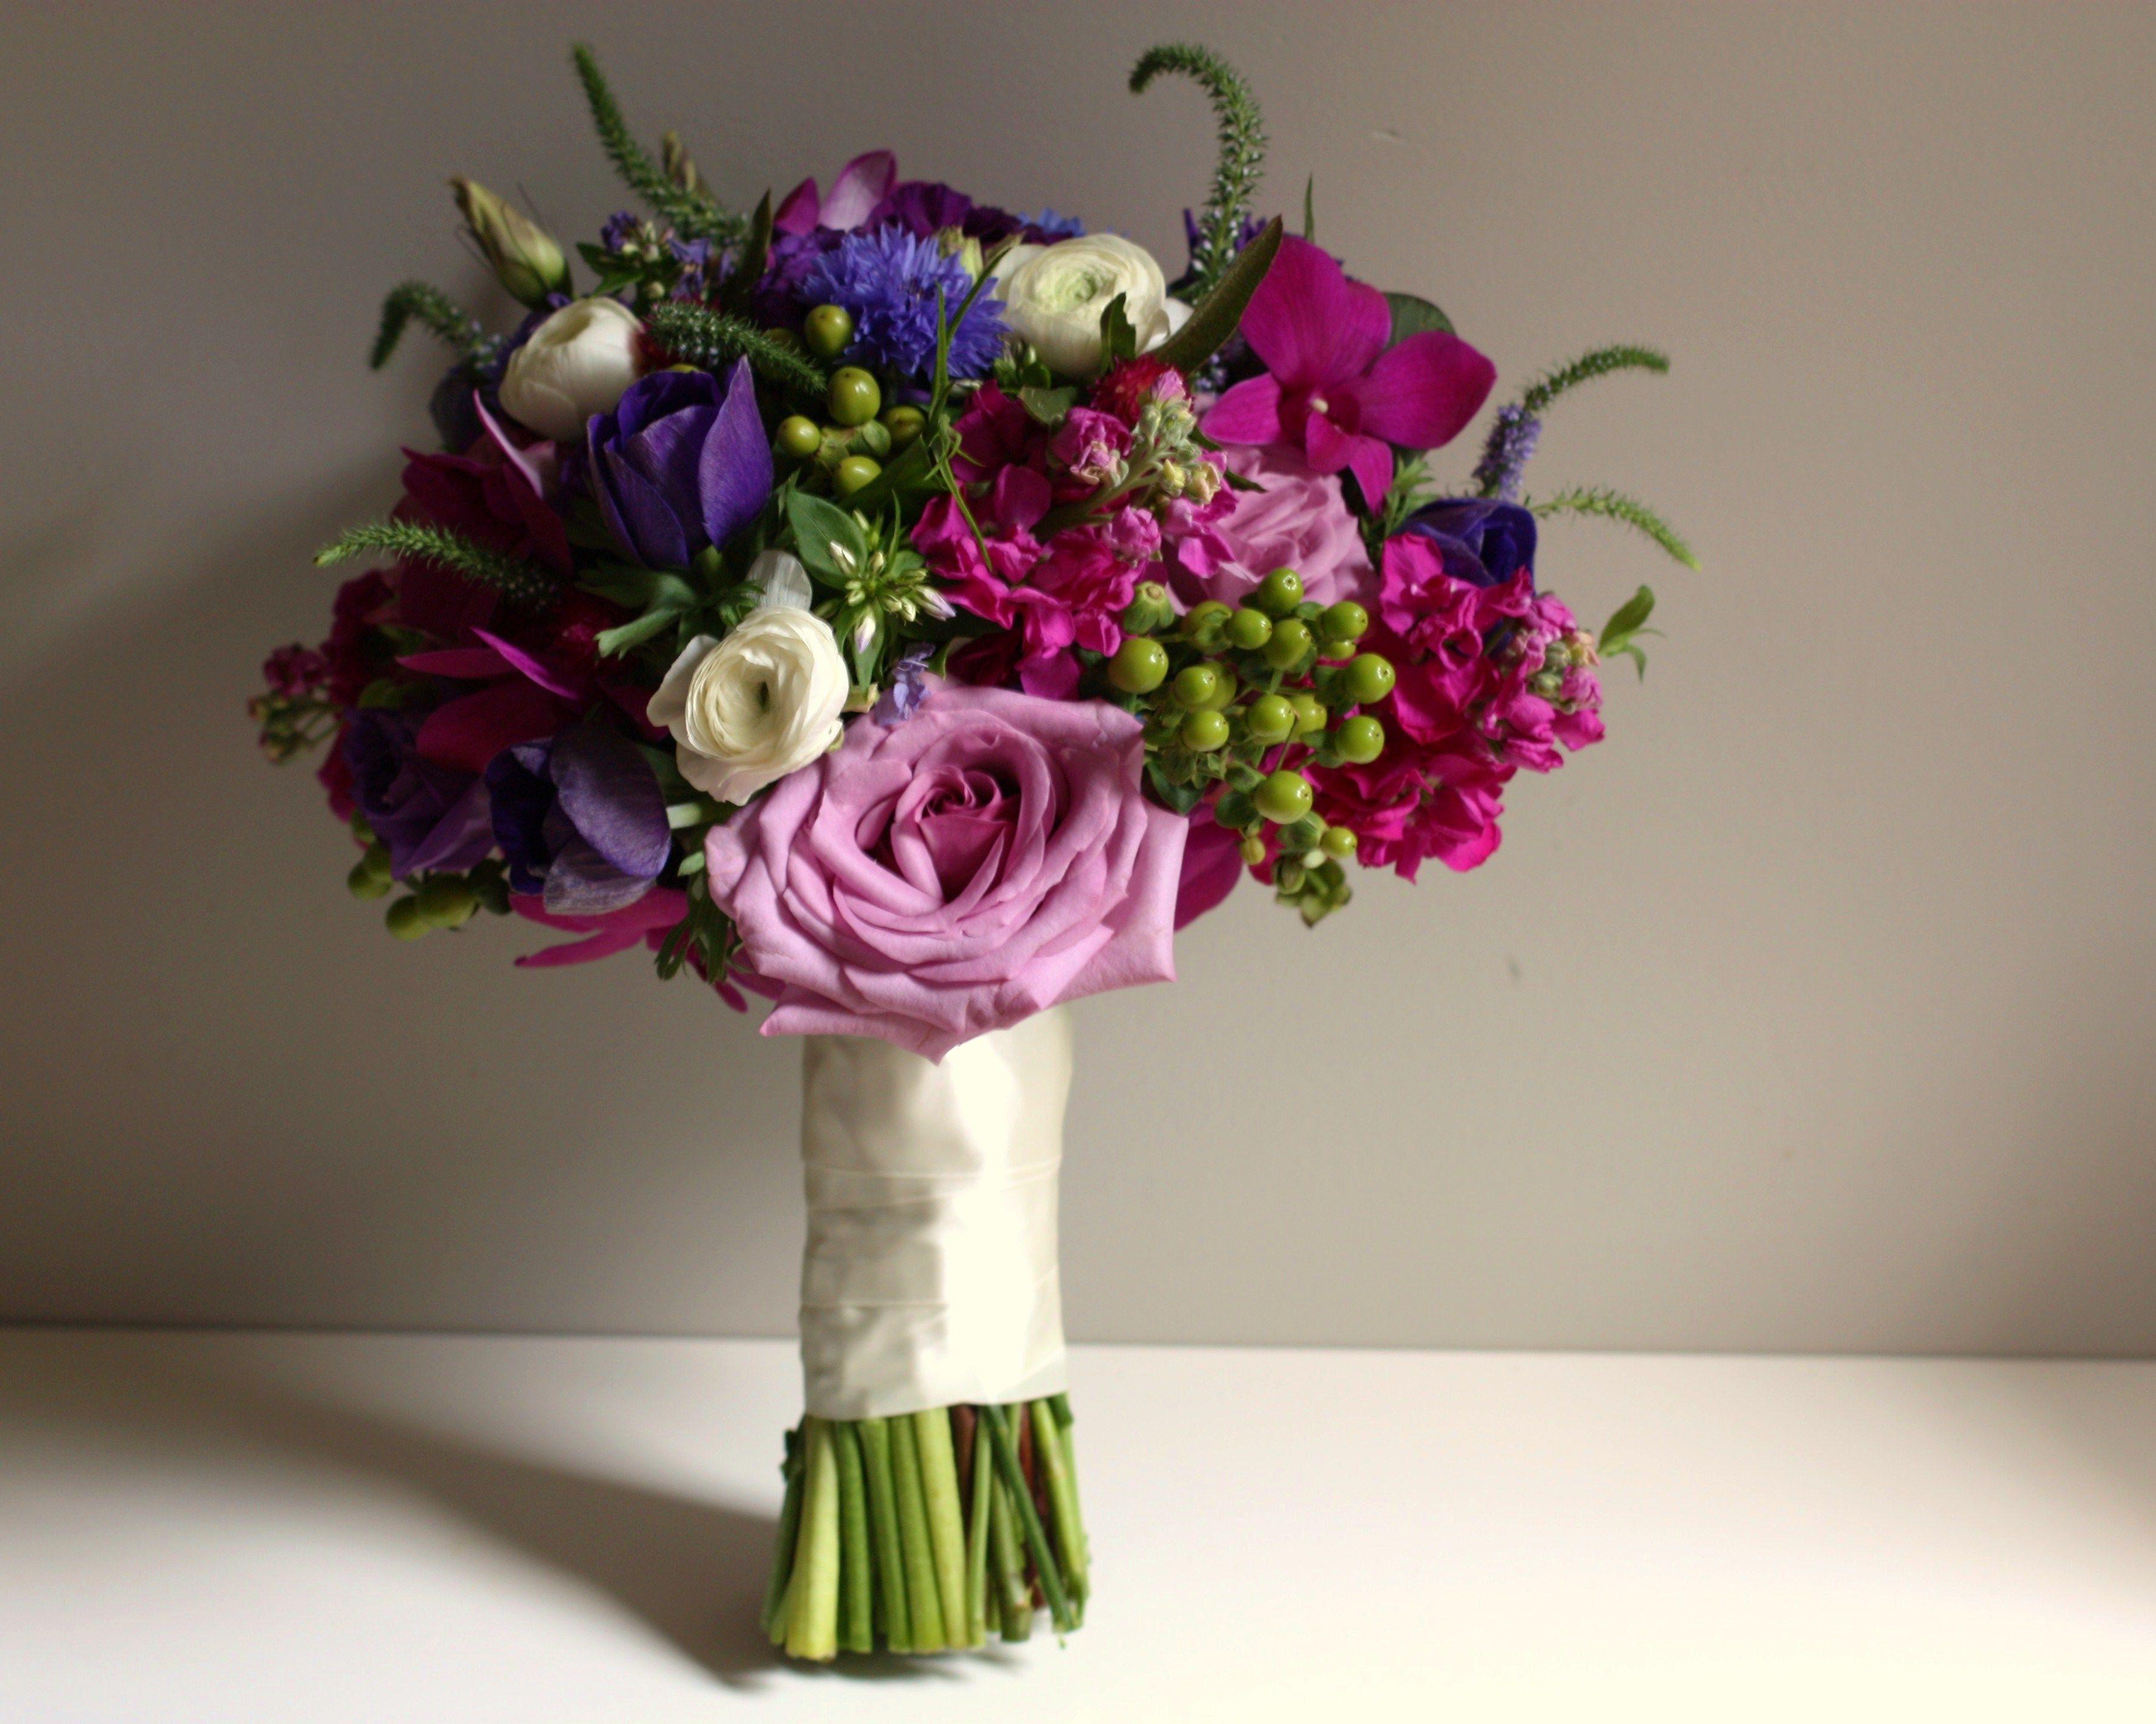 jewel toned wedding flowers  Jewel Toned Purple Fuchsia